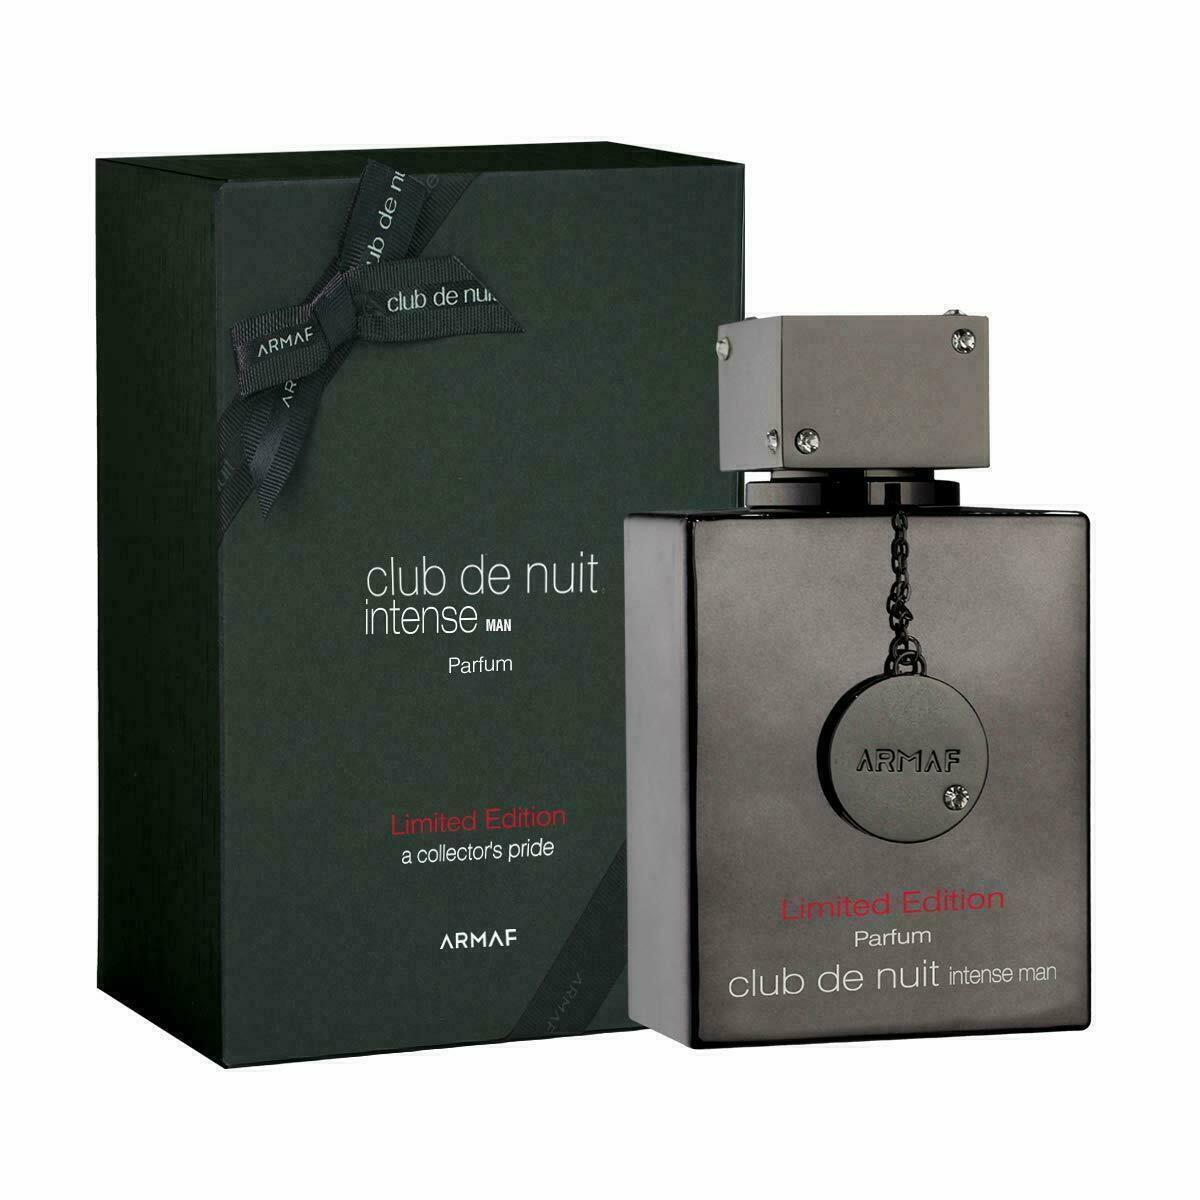 Club de nuit intense Limited Ed by Armaf 3.6 oz 105 ml EDP Parfum Spray SEALED - $89.99